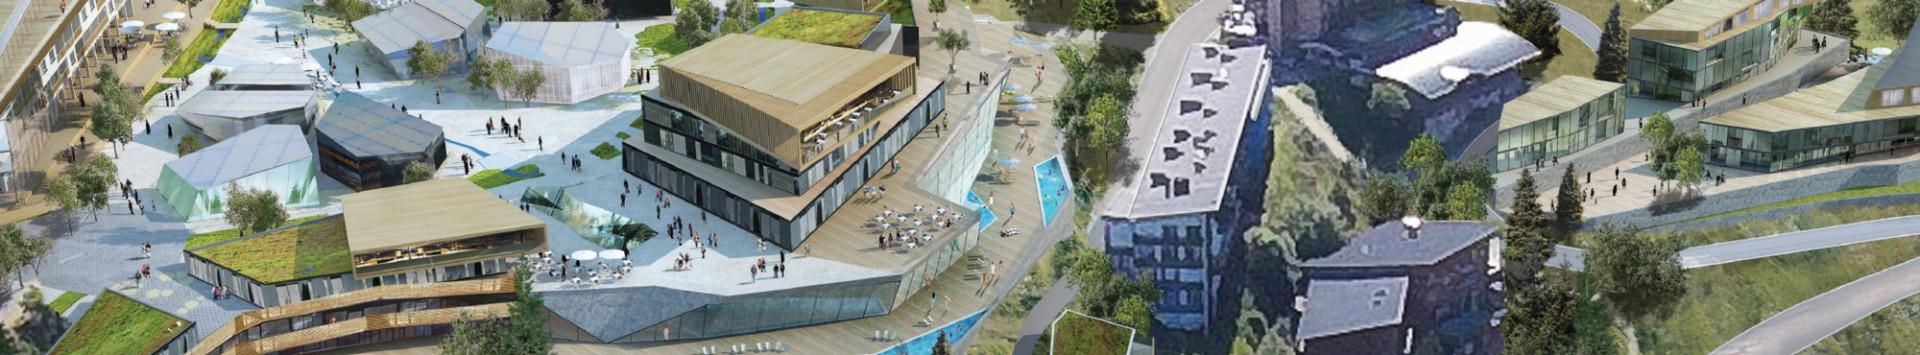 Projet Chamrousse 2030